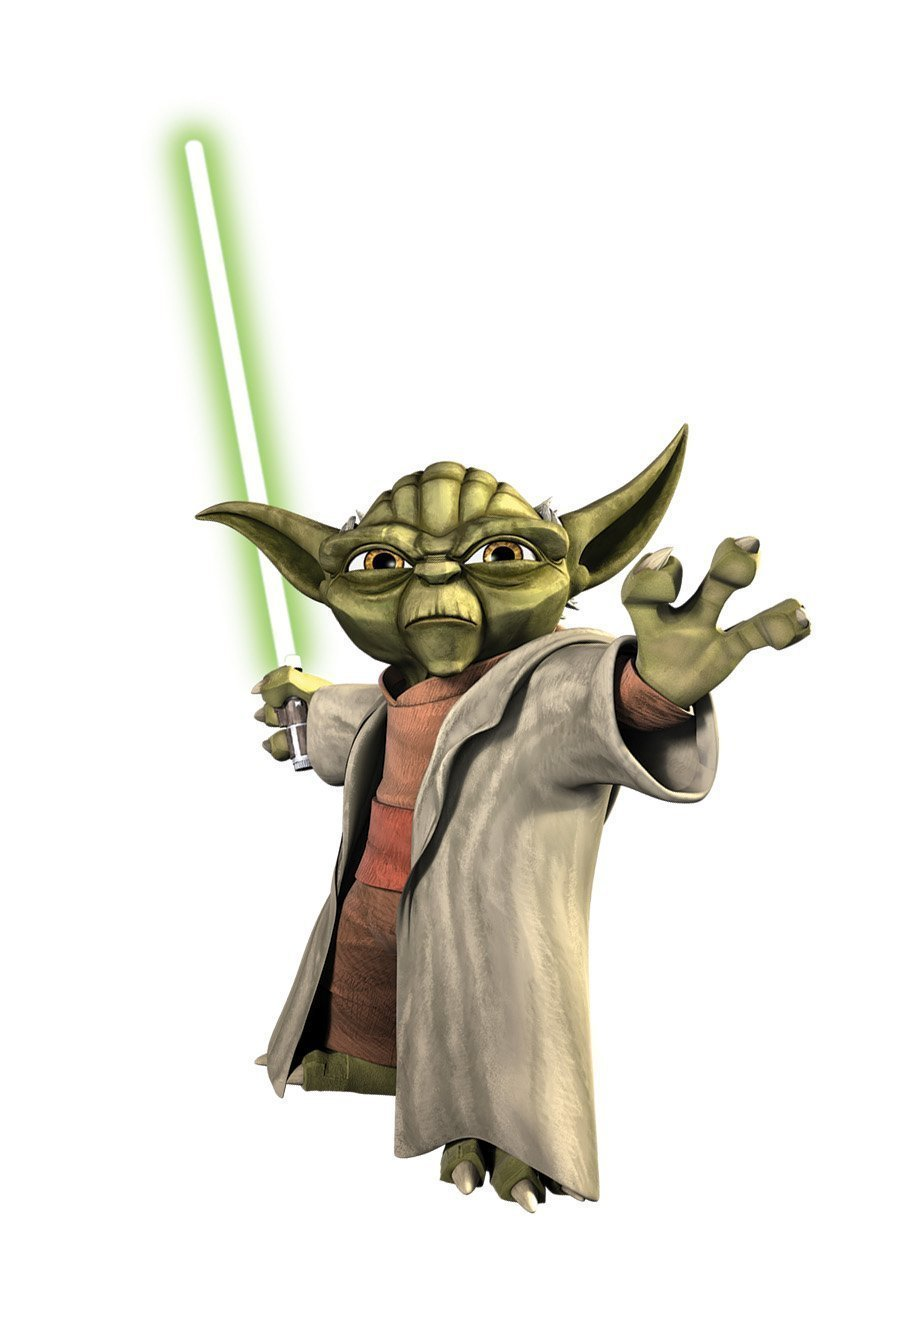 Star Wars Movie - The Clone Wars - Yoda Jedi Master Giant Wall Decal Sticker